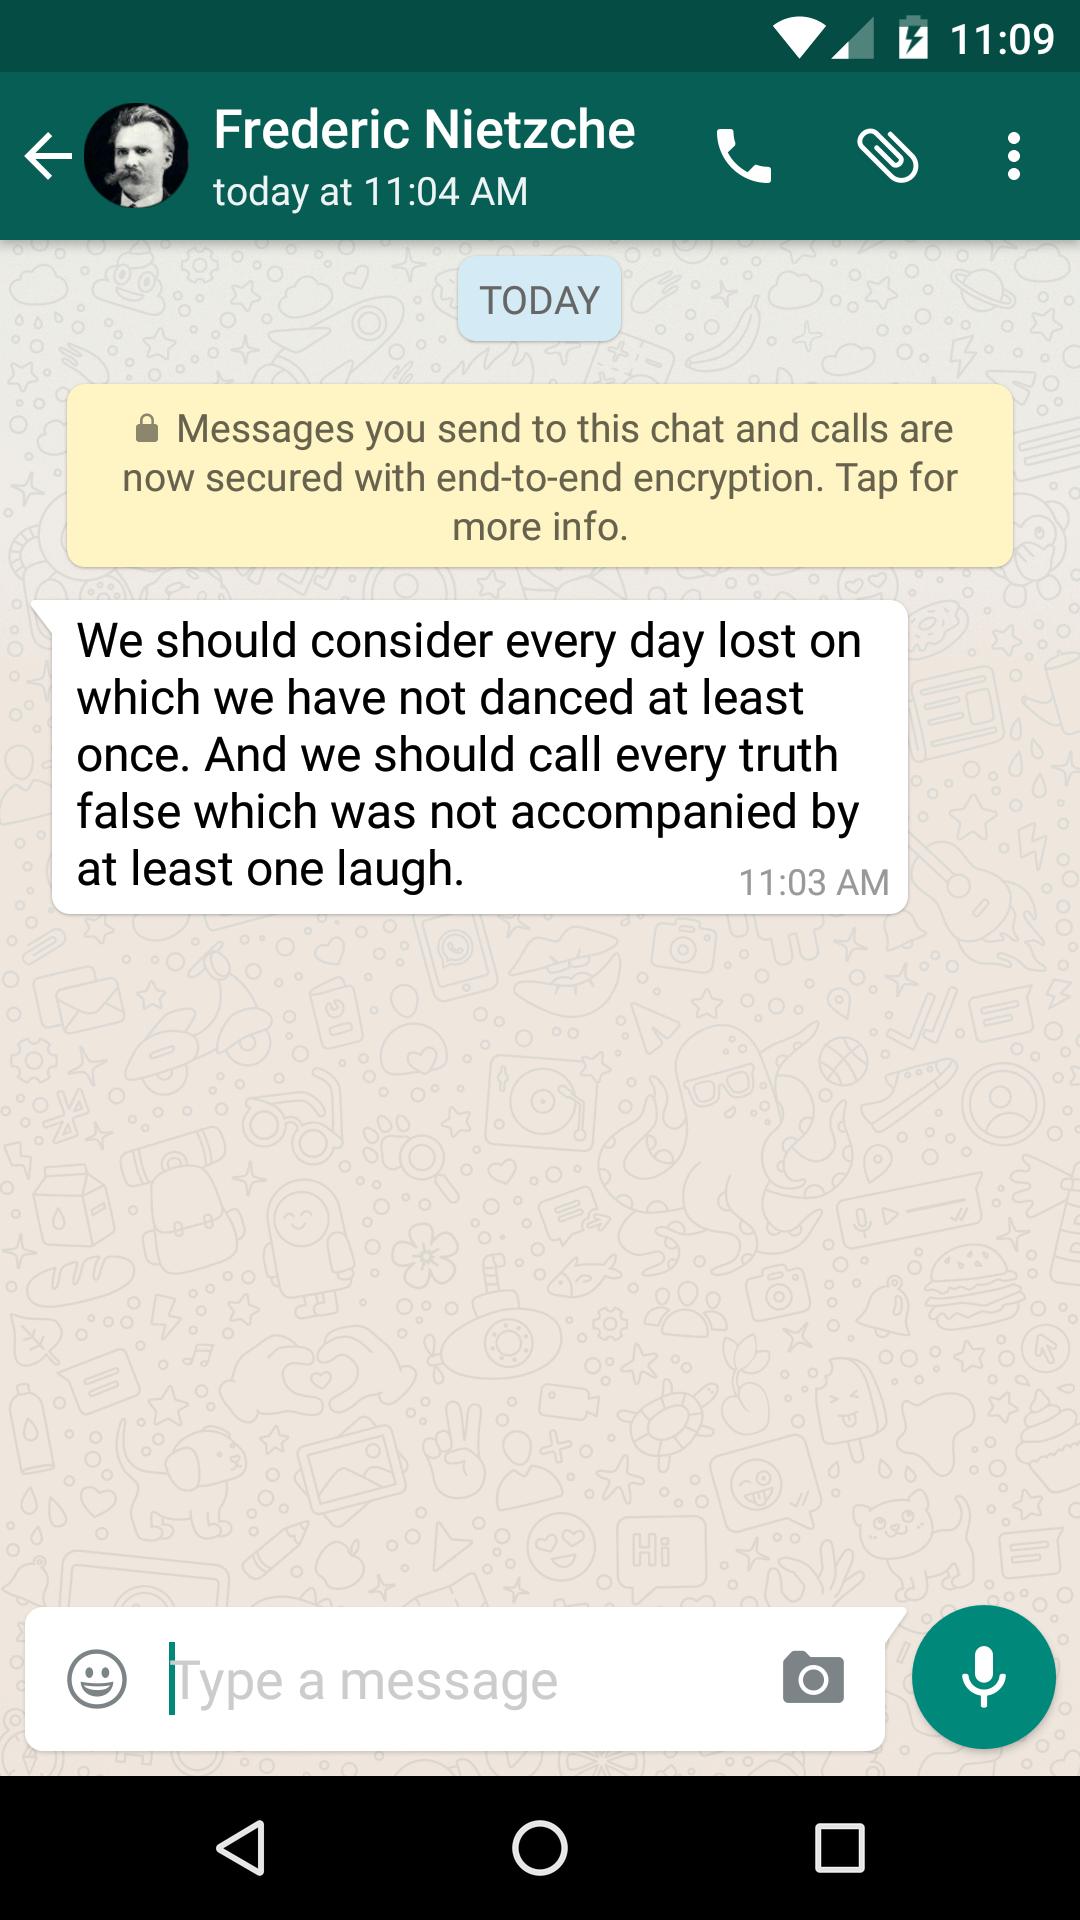 WhatsApp encryption announcement message